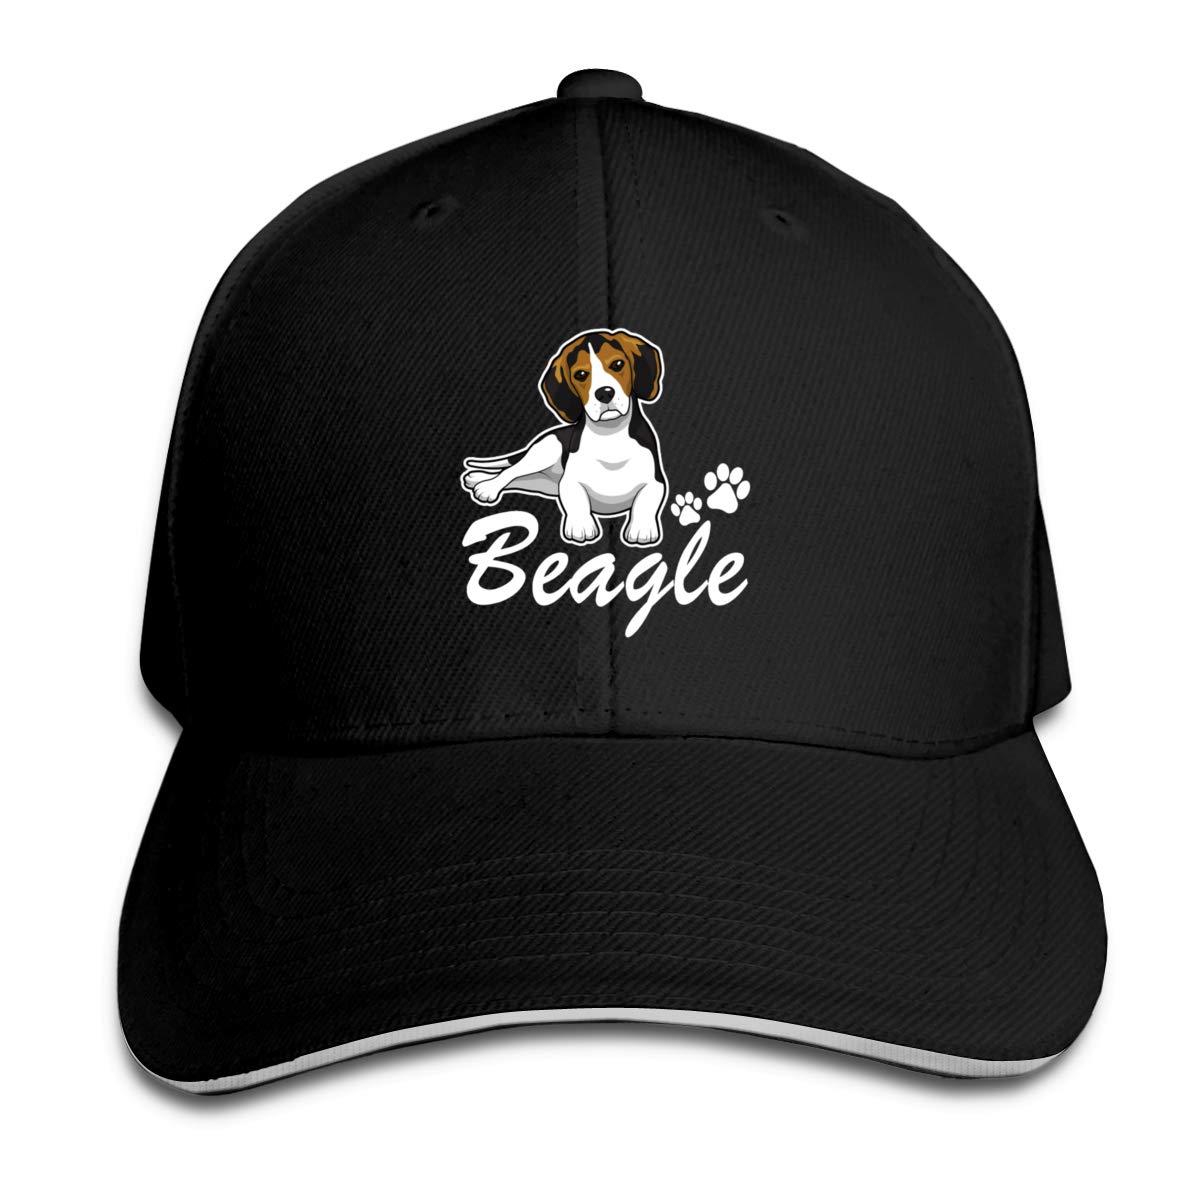 Happy Beagle, gorros de béisbol para hombres, gorros de papá tipo sándwich con visera ajustable, negro